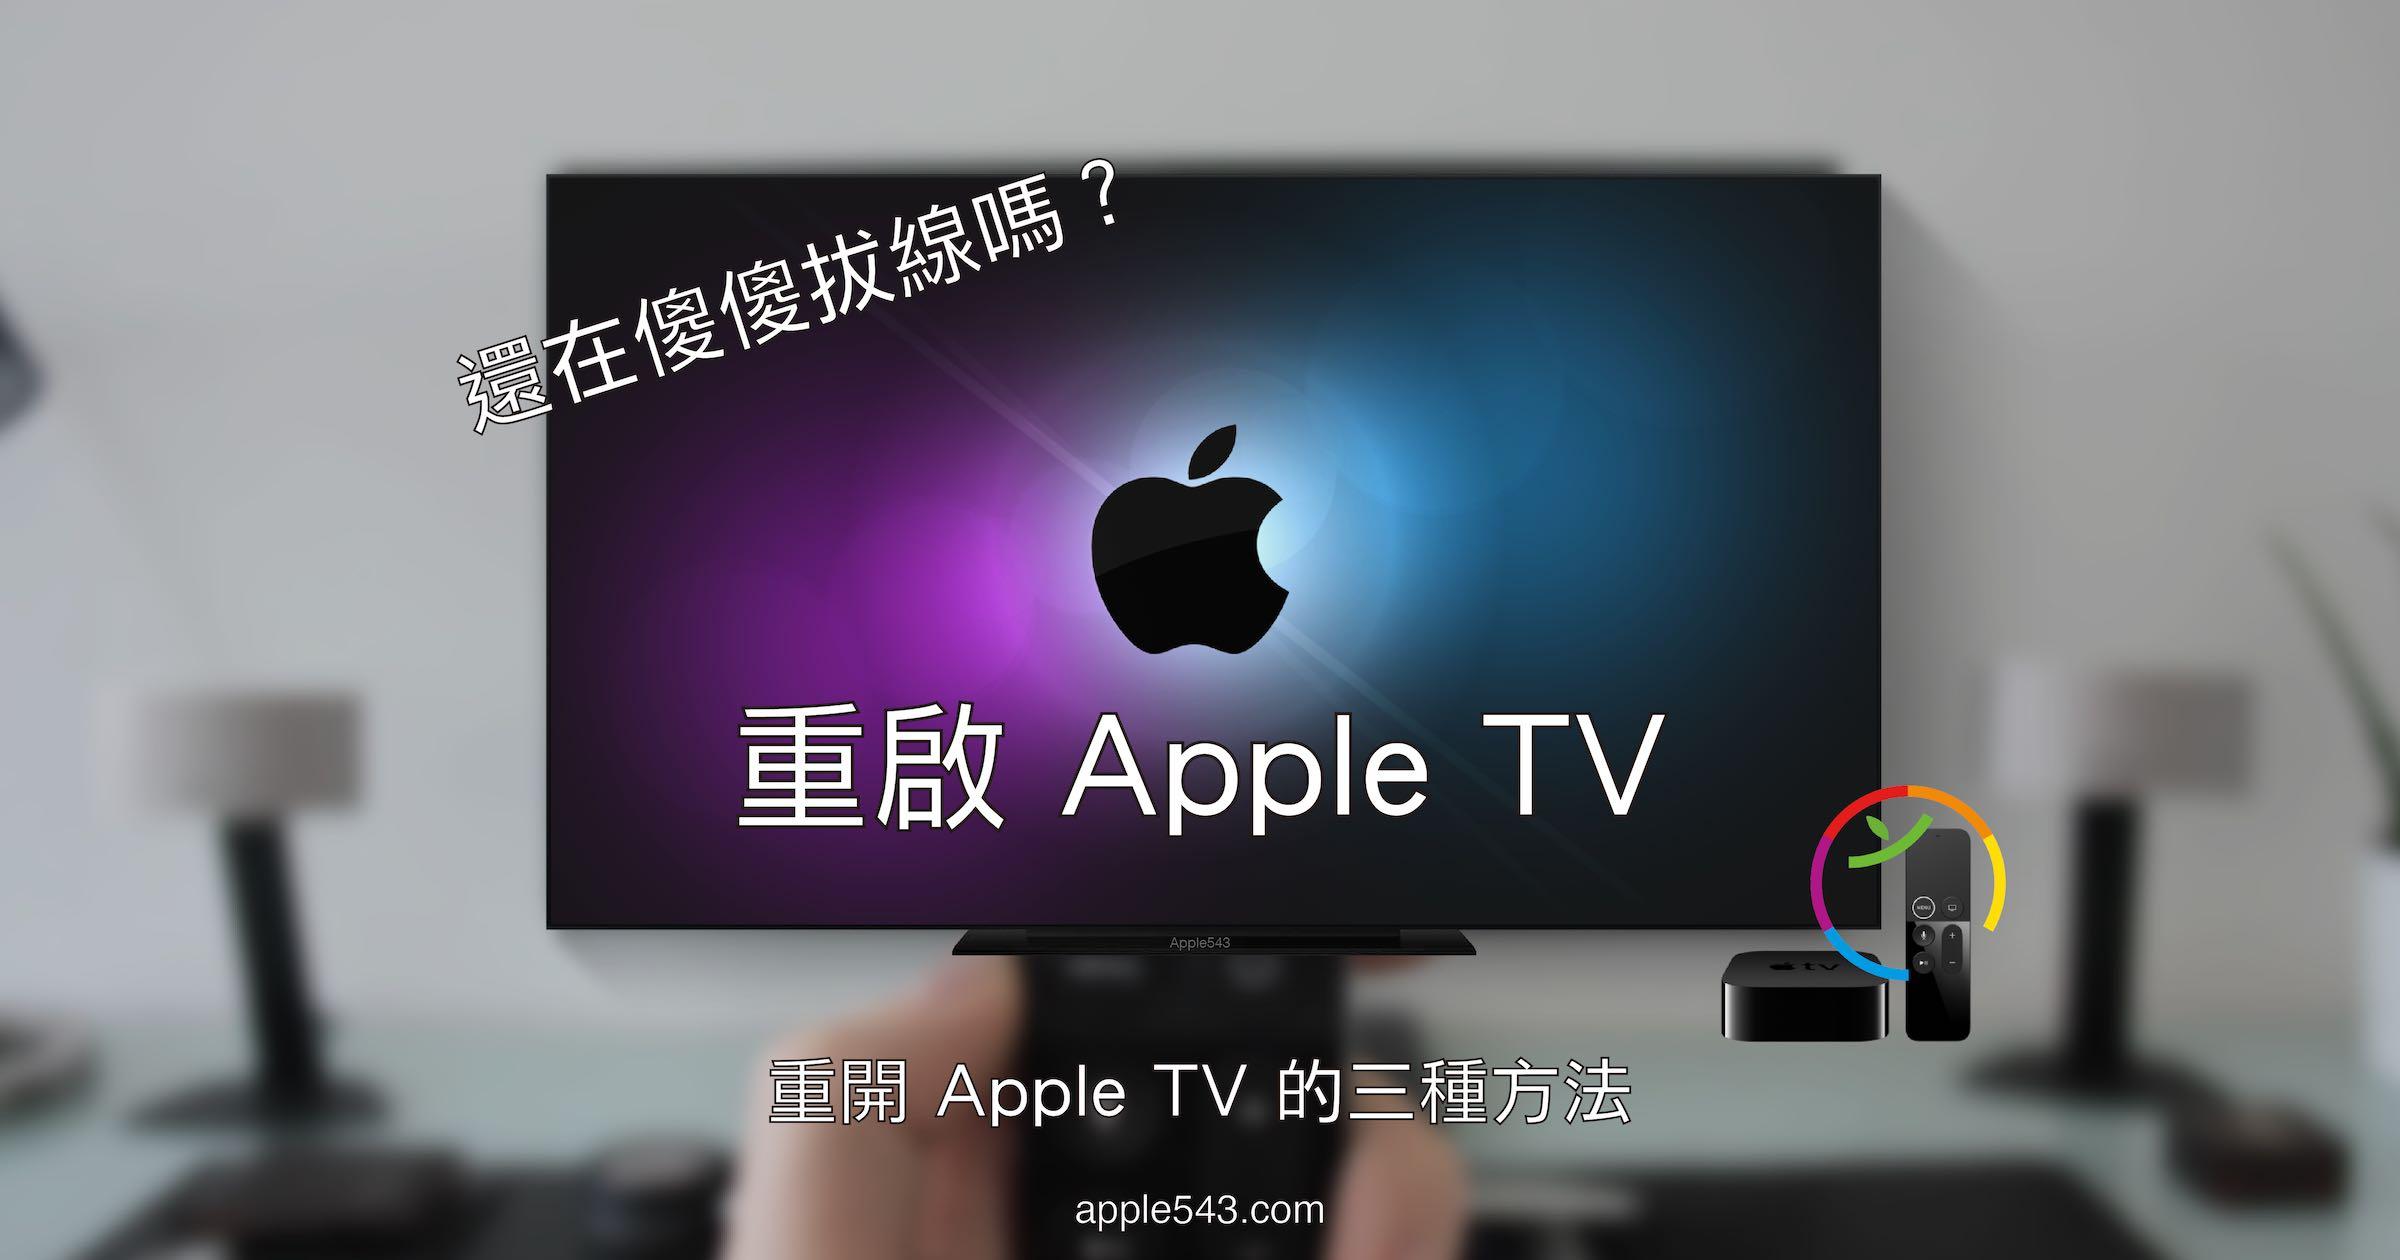 Apple TV 重開機